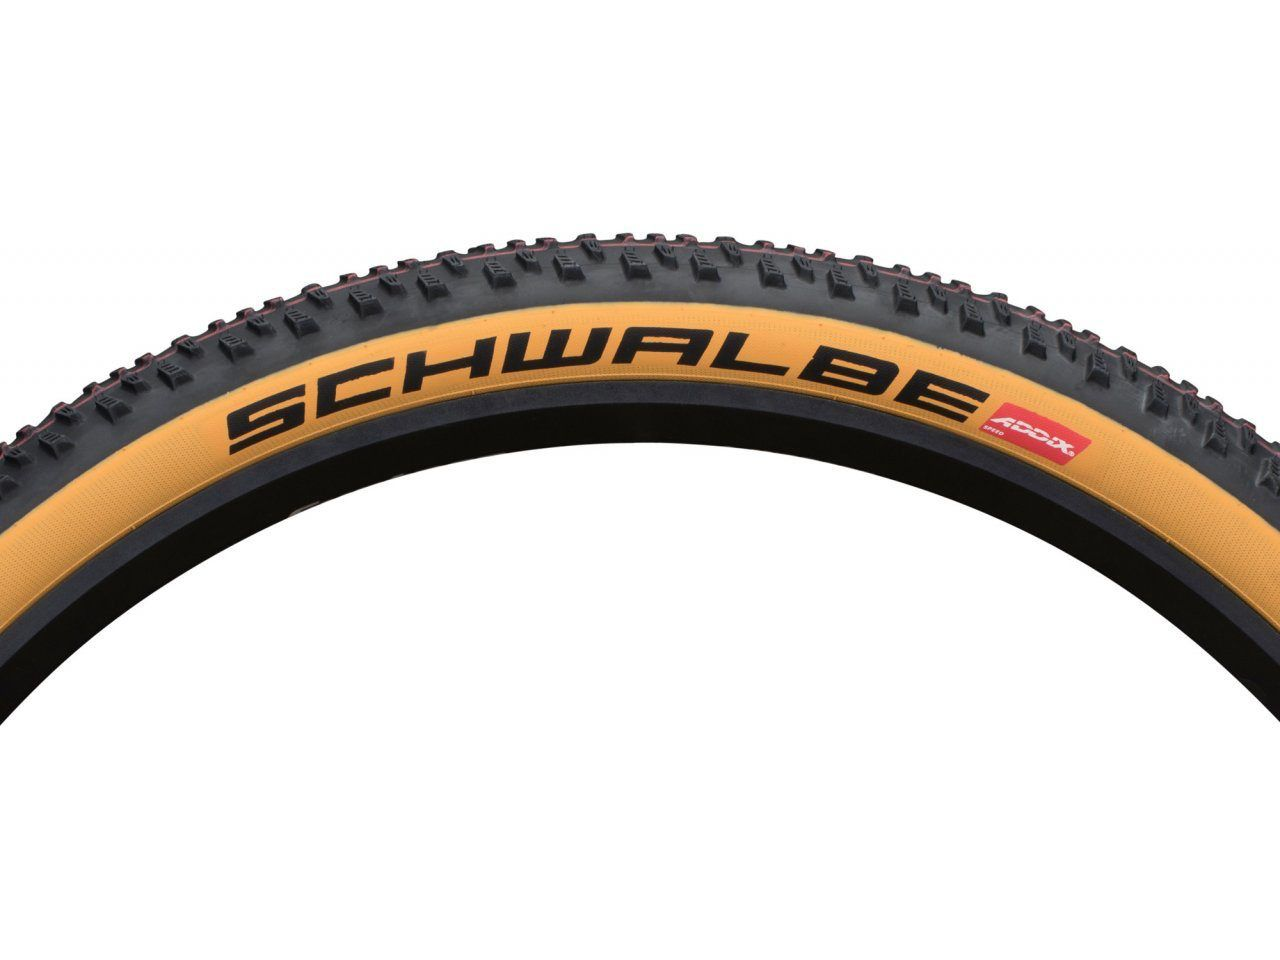 Par Pneus schwalbe Racing Ray + Racing Ralph 29x2,25 Snakeskin Addix